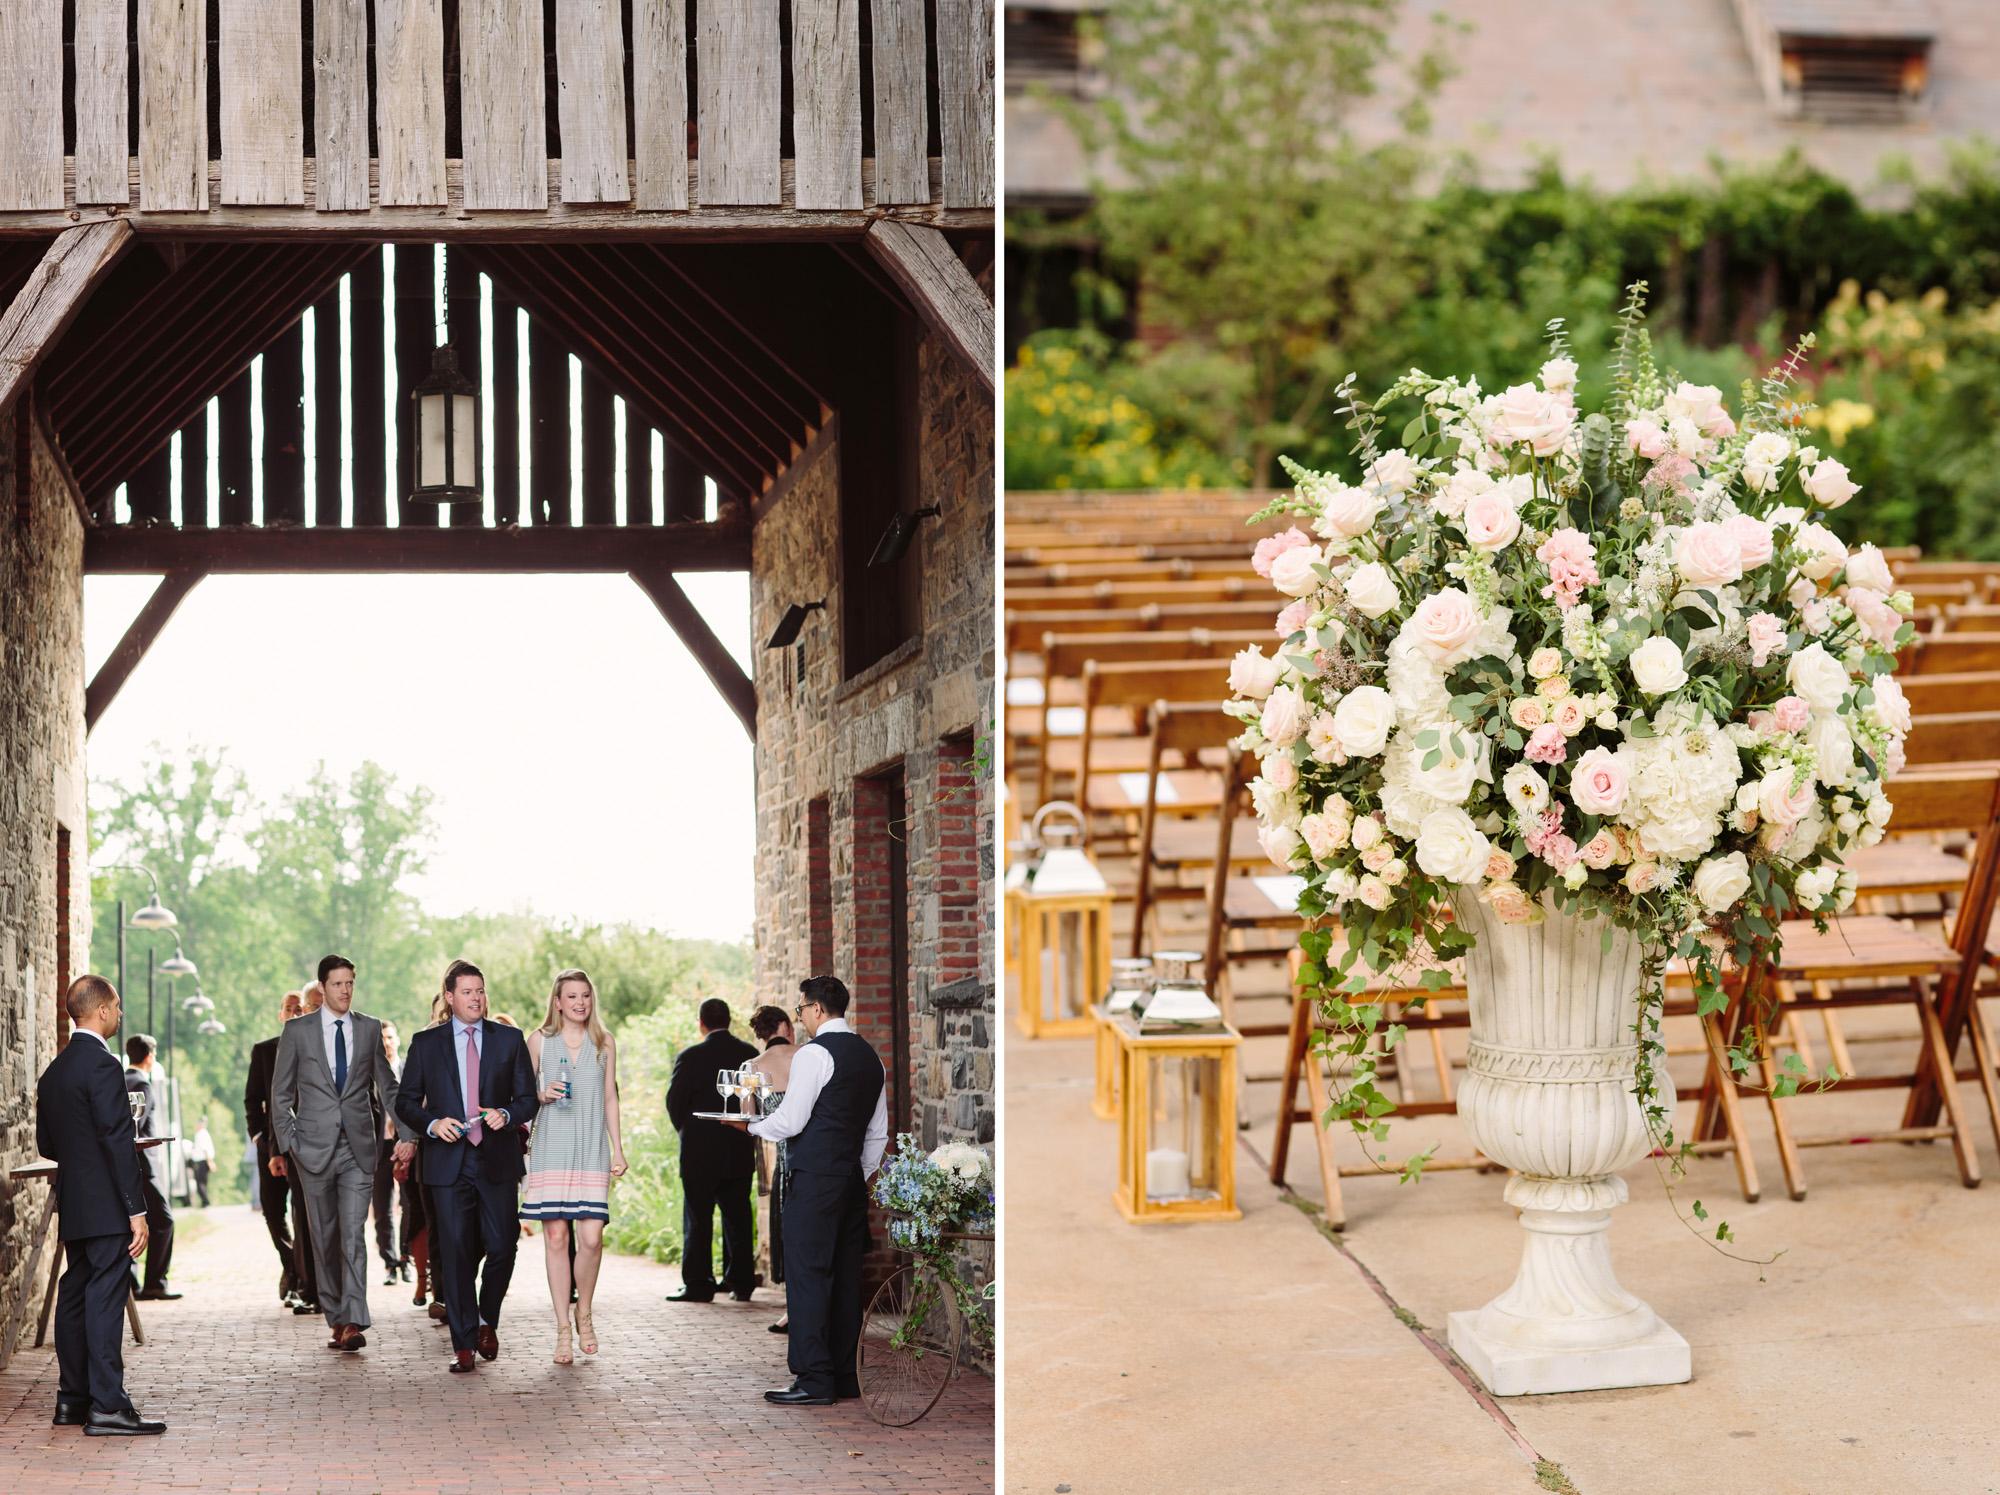 35_Jessica_Ted_Blue_Hill_Stone_Barns_Wedding_Pocantico_NY_Tanya_Salazar_Photography.jpg